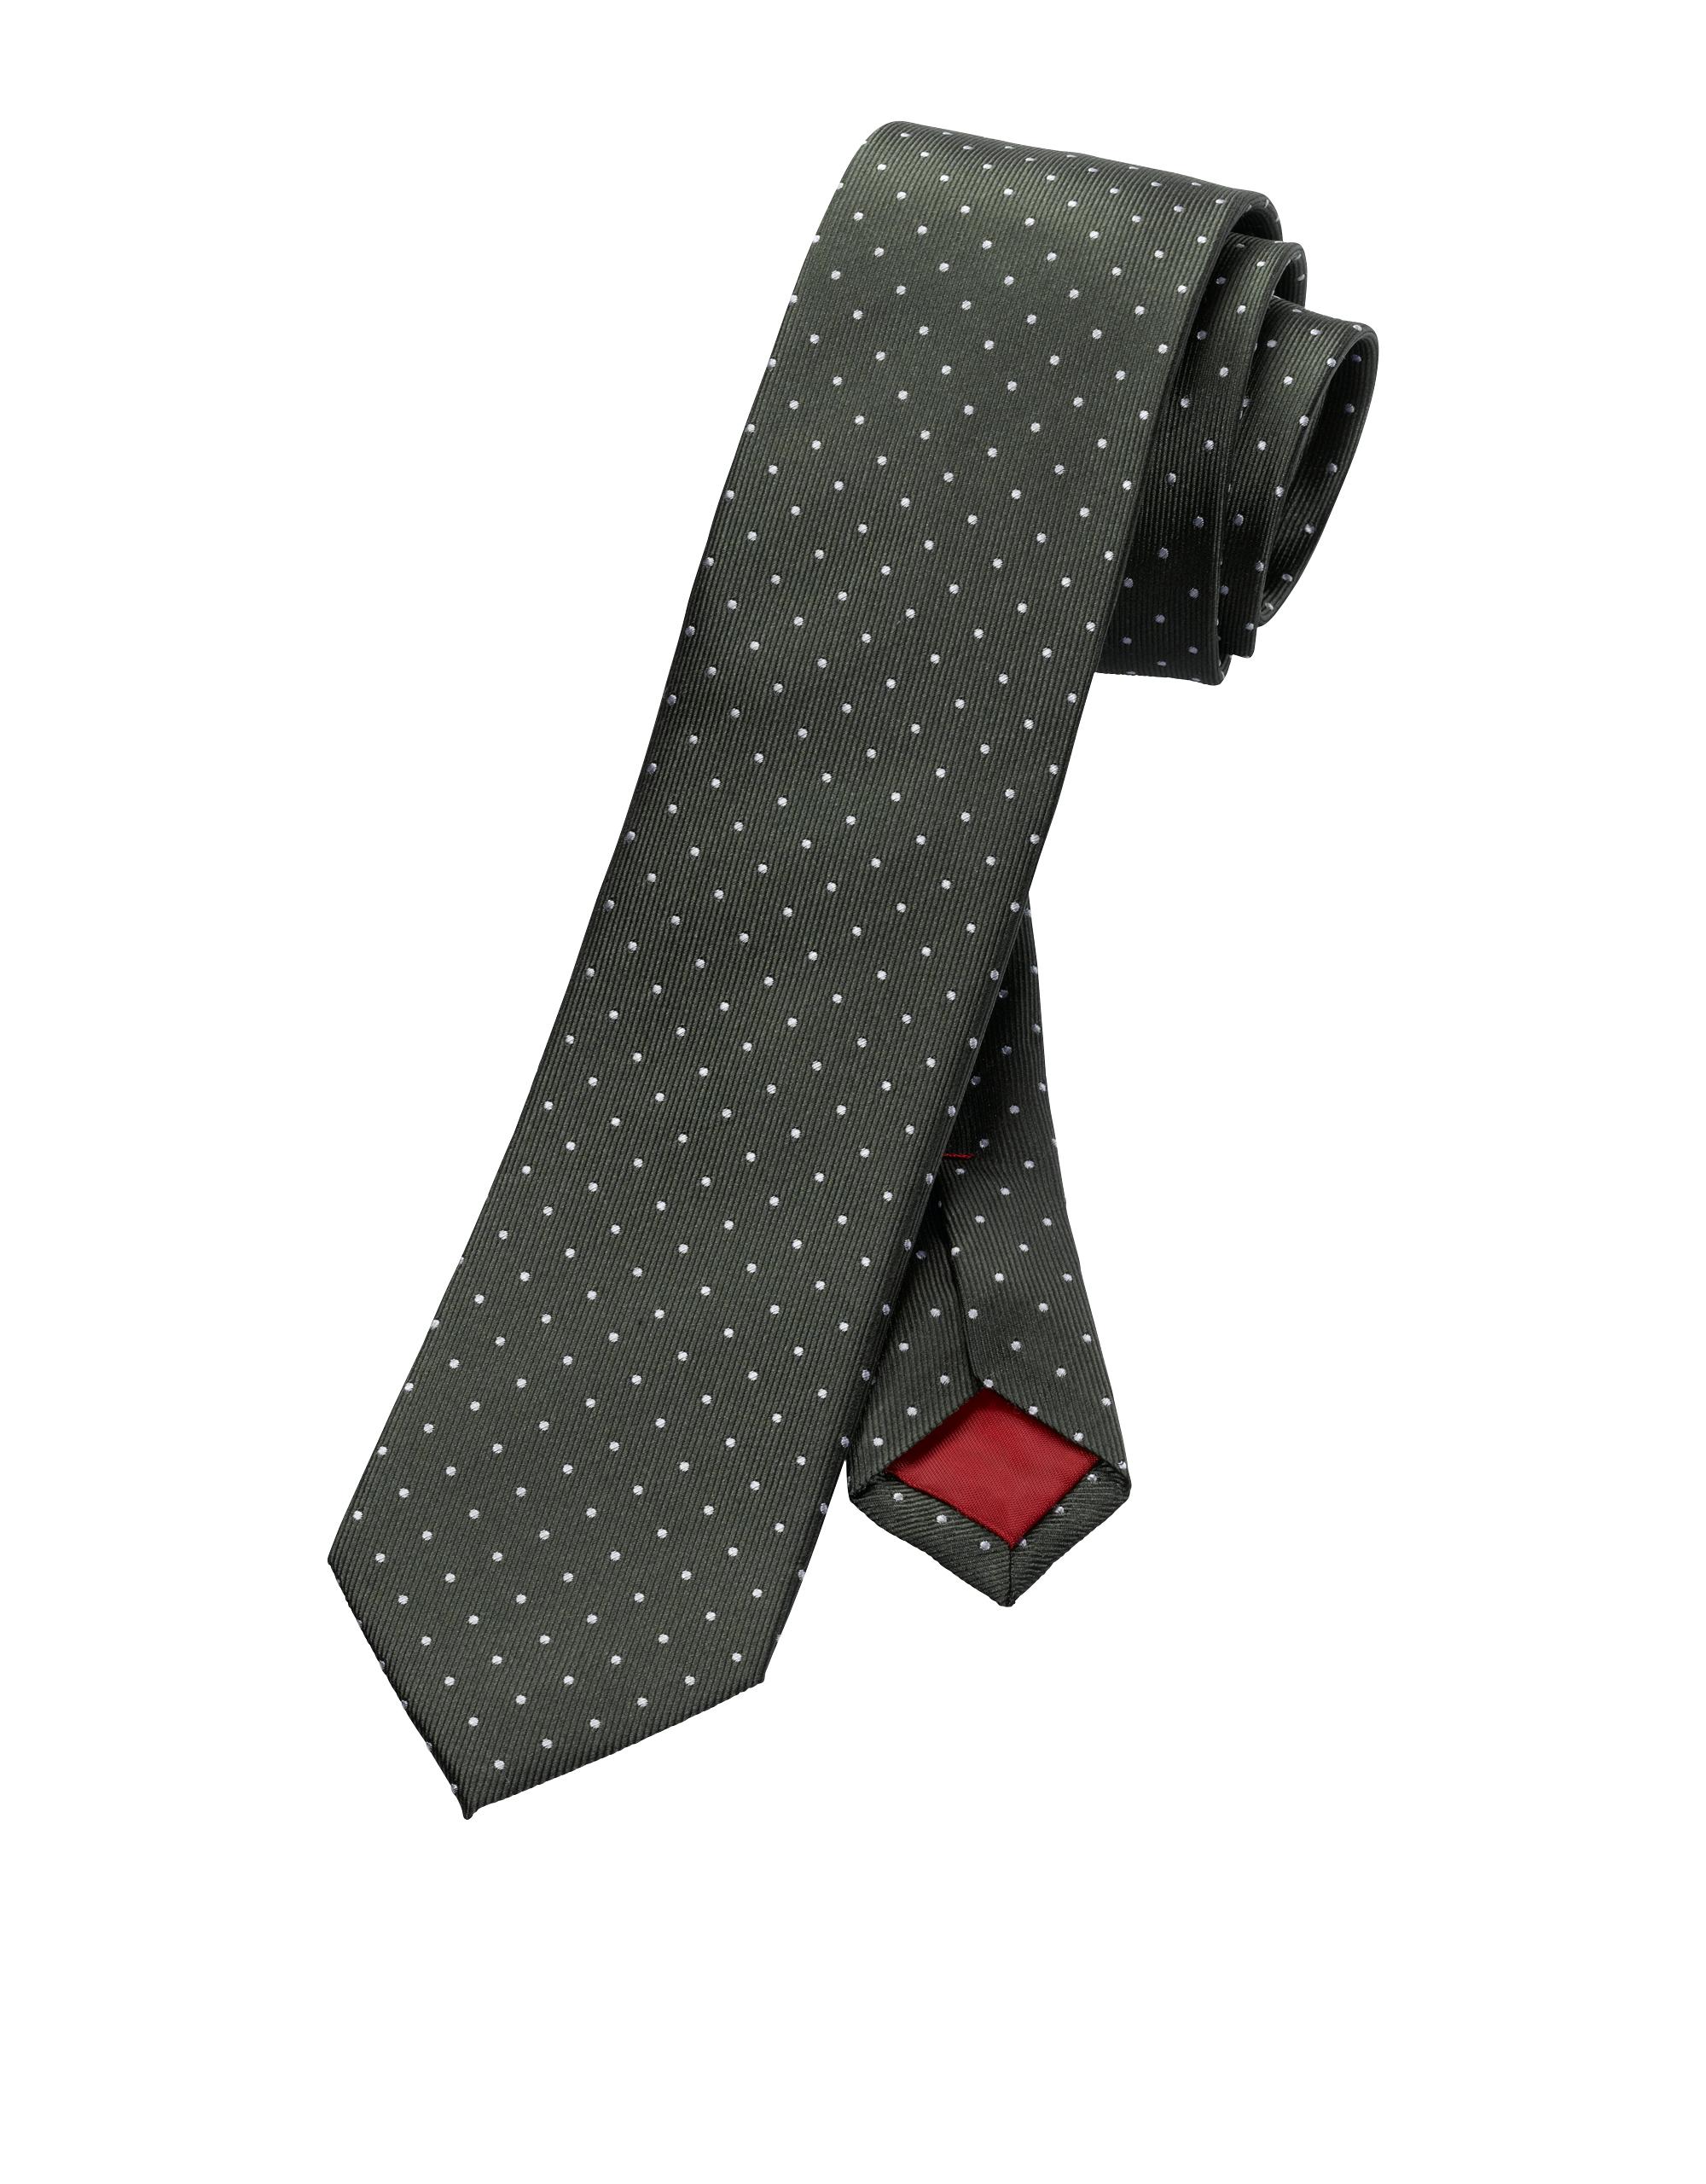 OLYMP Krawatte, Schlamm, | Accessoires | Schlamm | 100% seide | OLYMP Krawatte